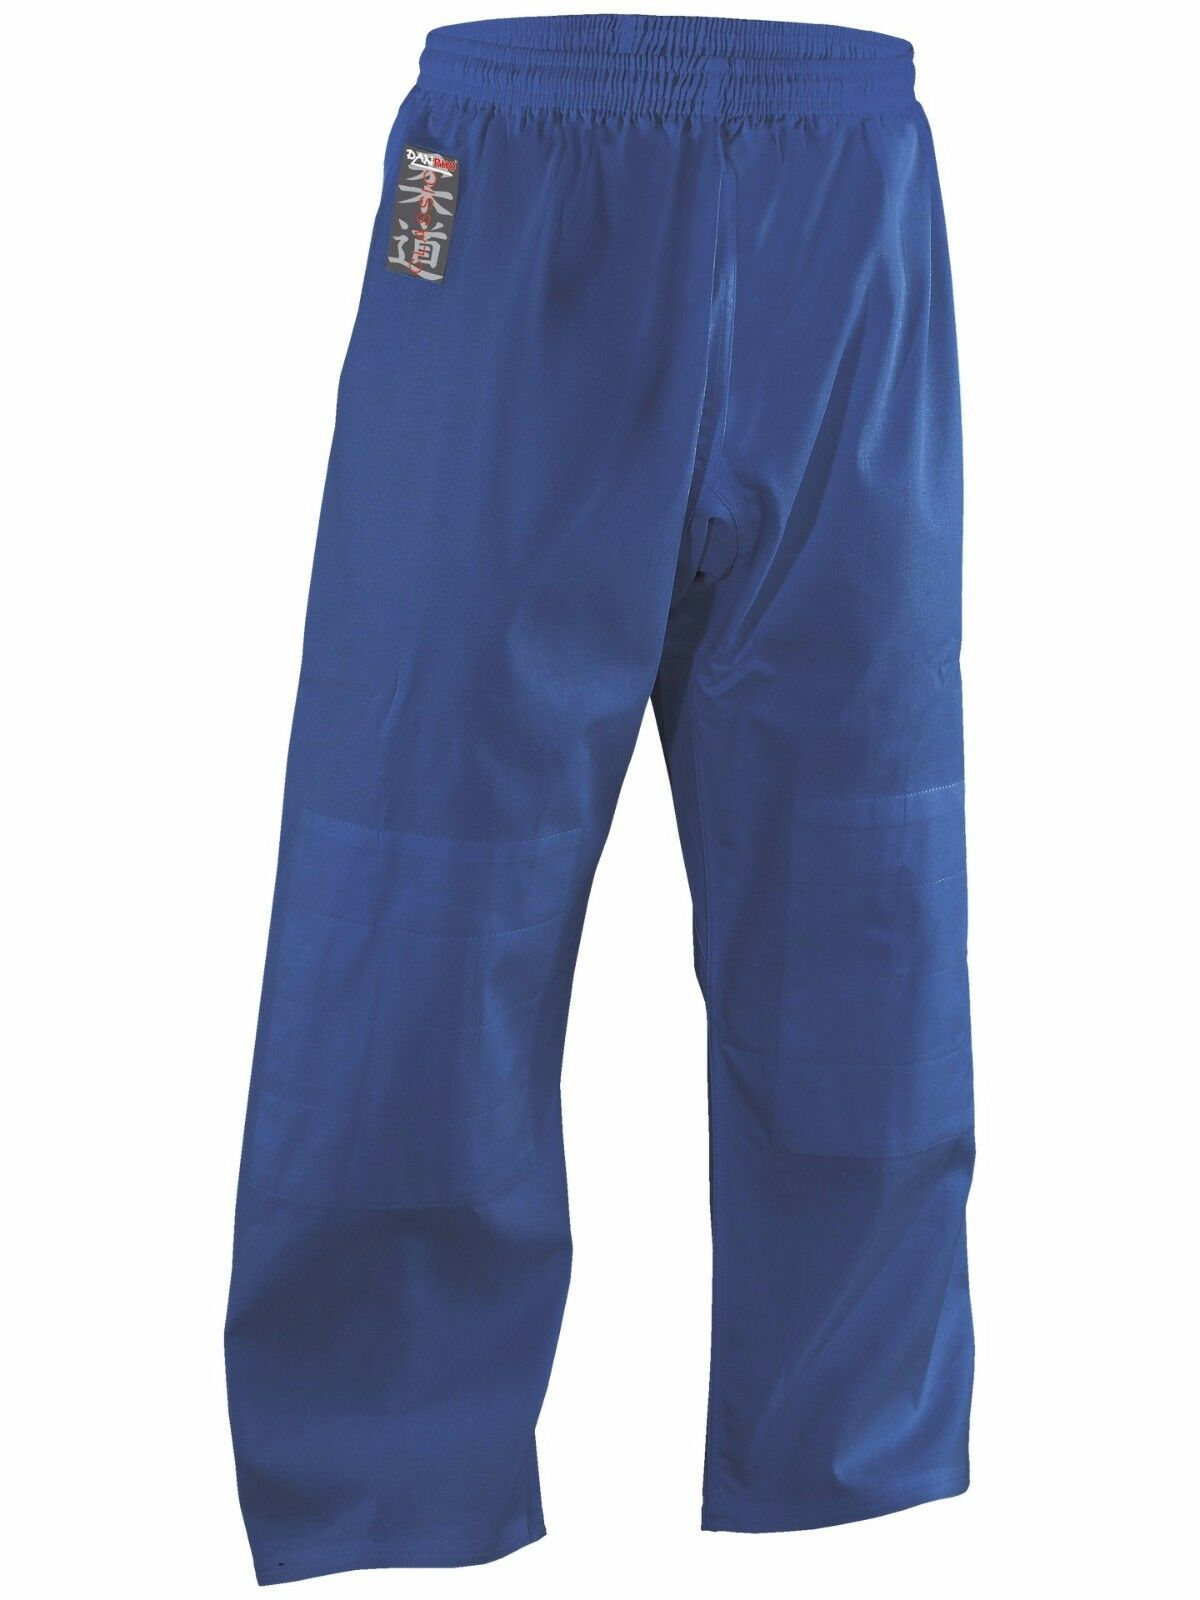 Judoanzug-DanRho® Classic 140-200 blau, Ju-Jutsu Ju-Jutsu Ju-Jutsu Aikido 550g m² Kwon® Judoanzug 453528